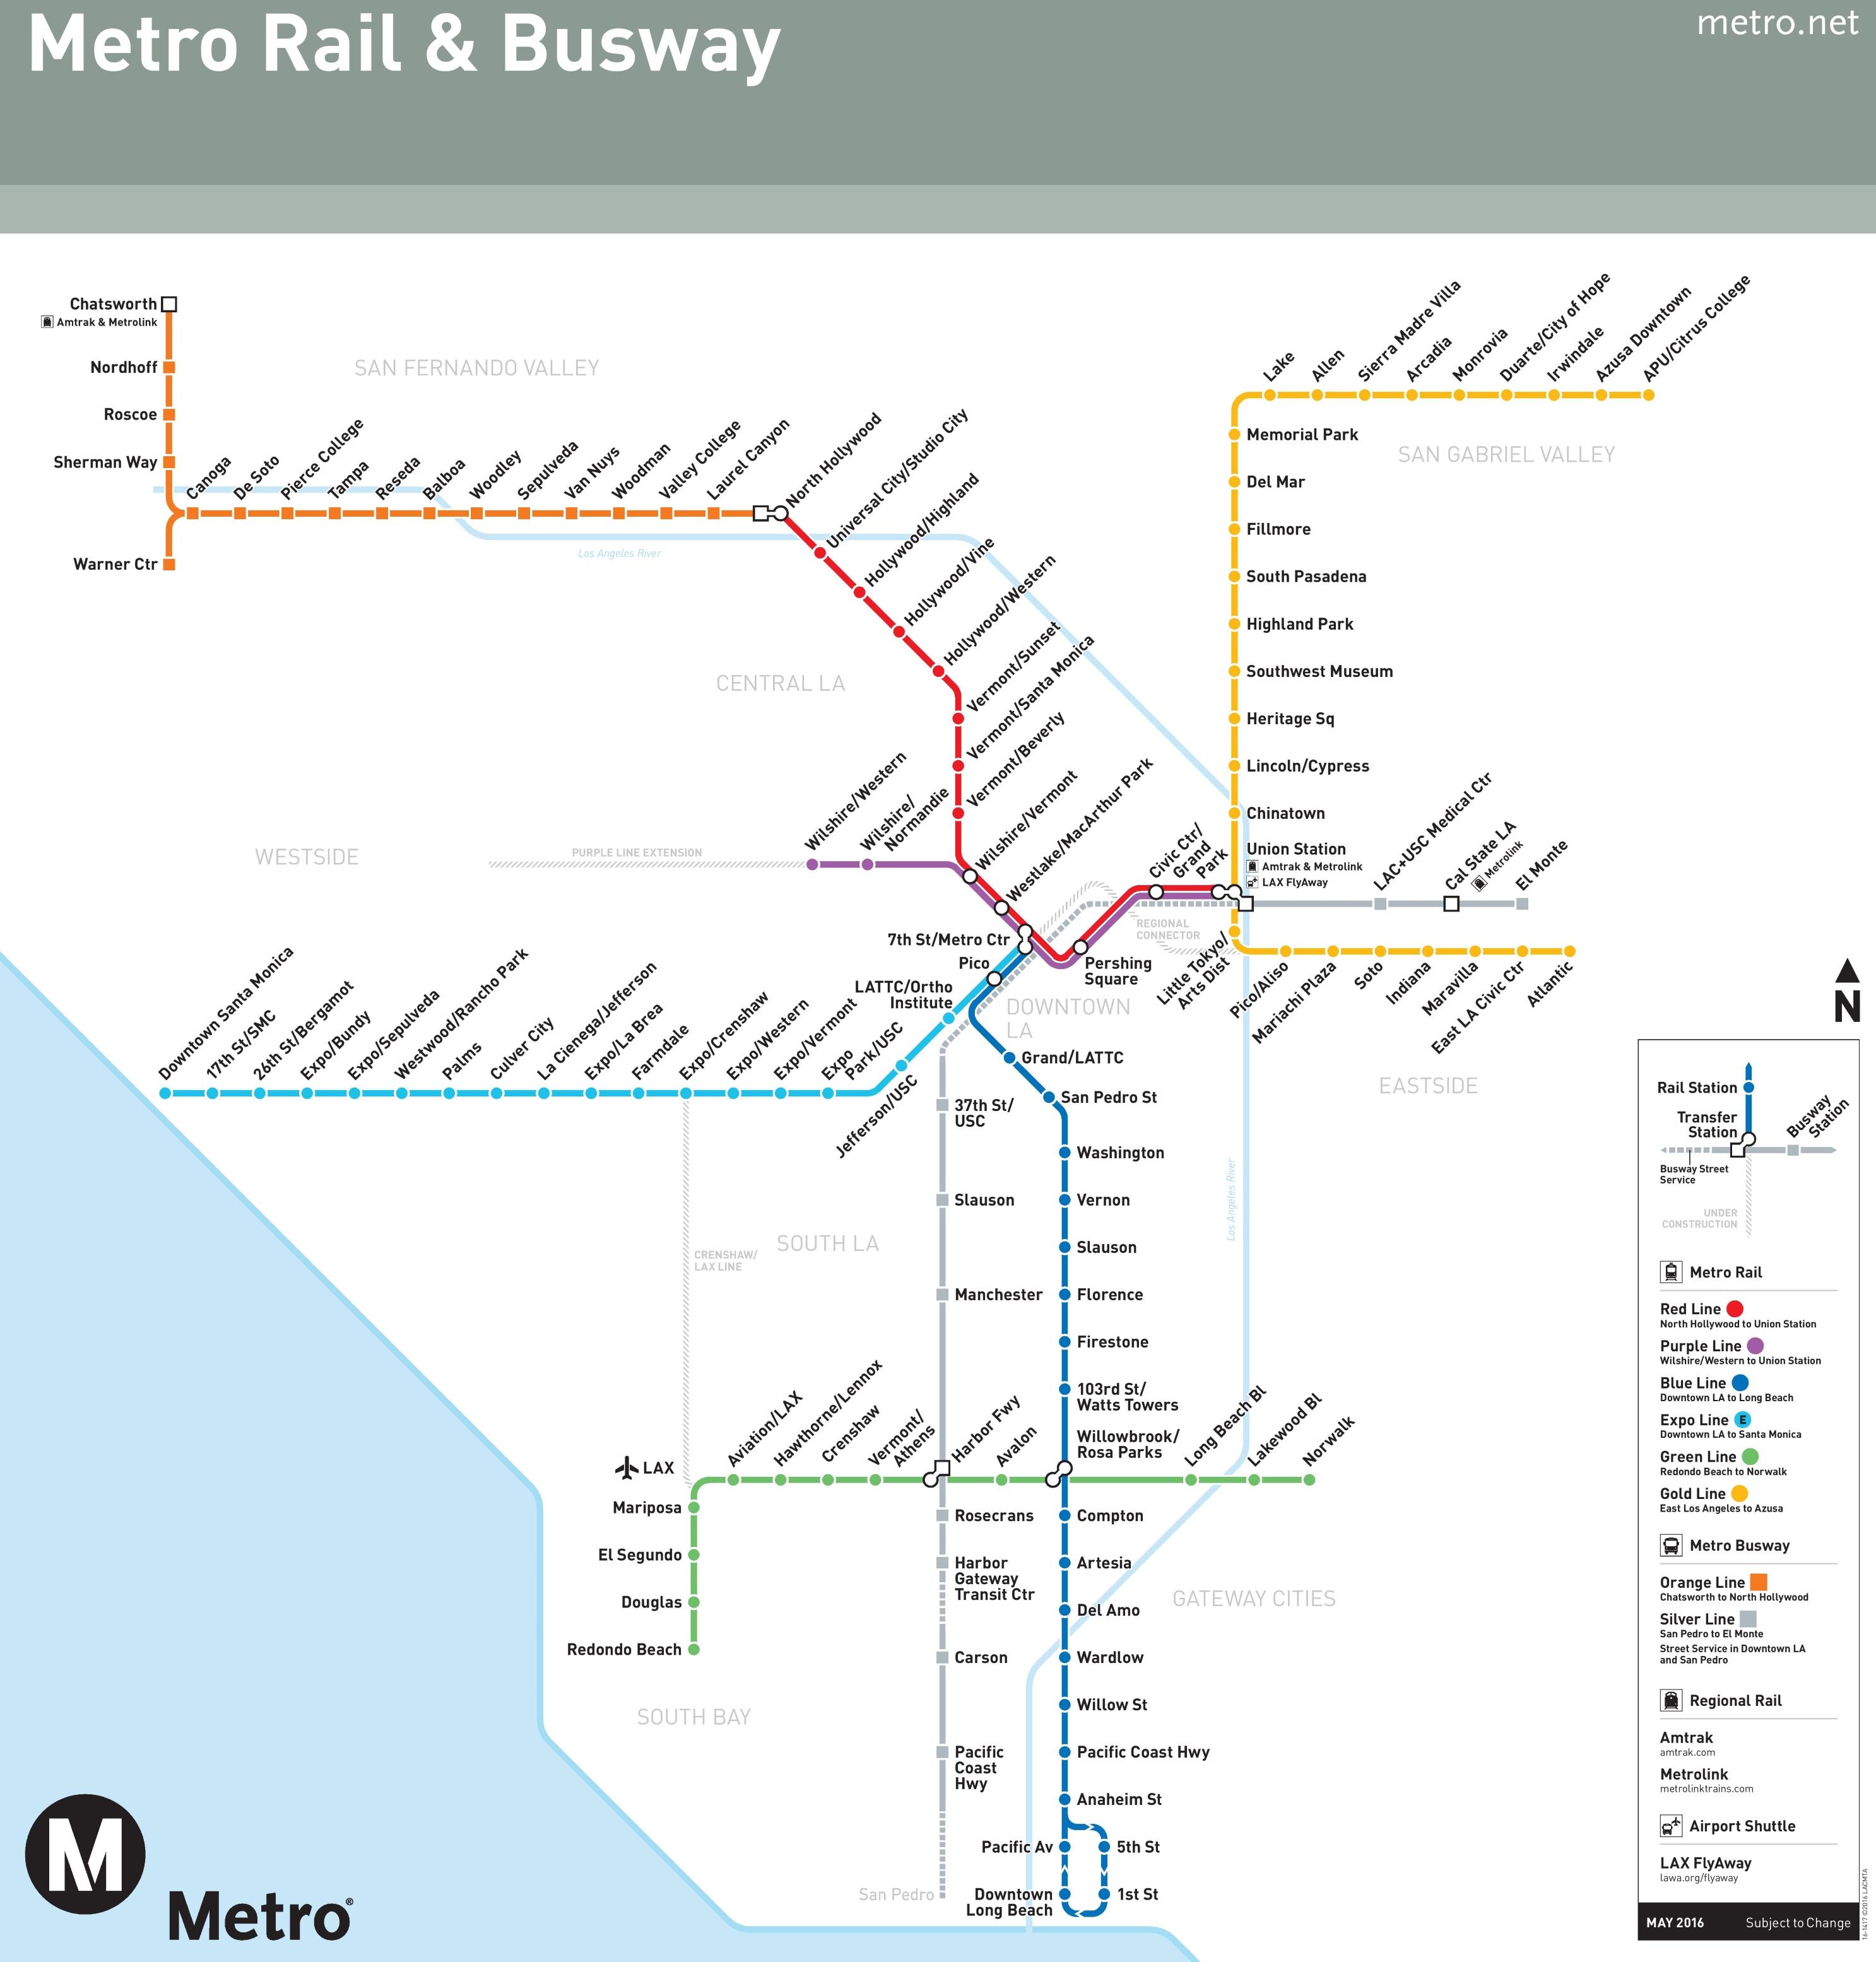 Los Angeles Subway Map Los Angeles subway map Los Angeles Subway Map